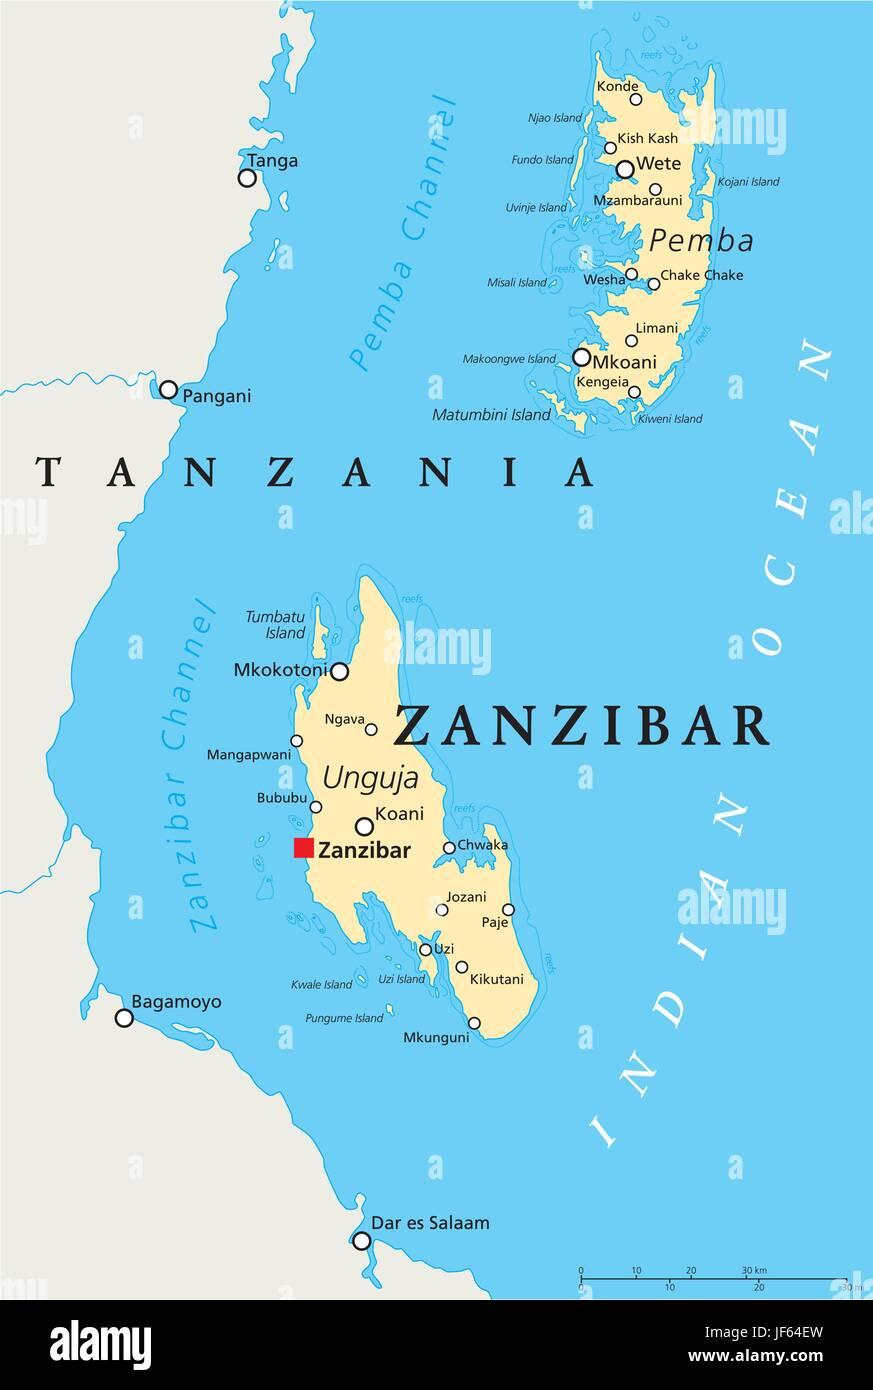 Africa tanzania zanzibar map atlas map of the world travel africa tanzania zanzibar map atlas map of the world travel africa gumiabroncs Images